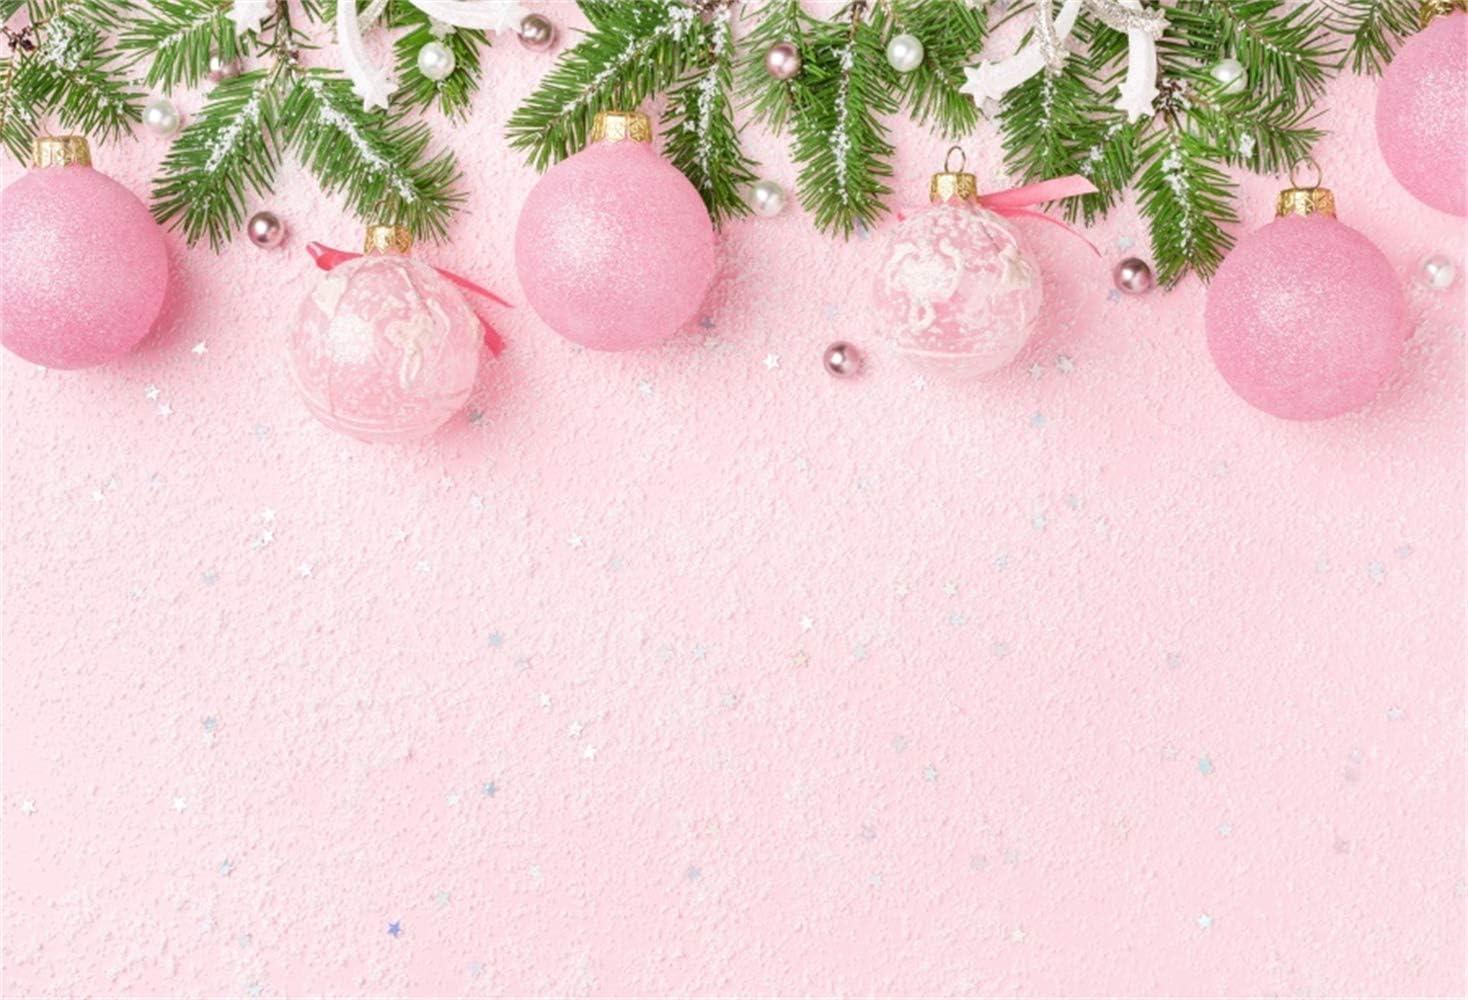 Amazon Com Laeacco Christmas Theme Backdrop 10x8ft Vinyl Pastel Pink Xmas Decoration Balls Pine Pink Texture Photo Background New Year S Eve Xmas Celebrating Party Banner Child Baby Kids Girl Adult Shoot